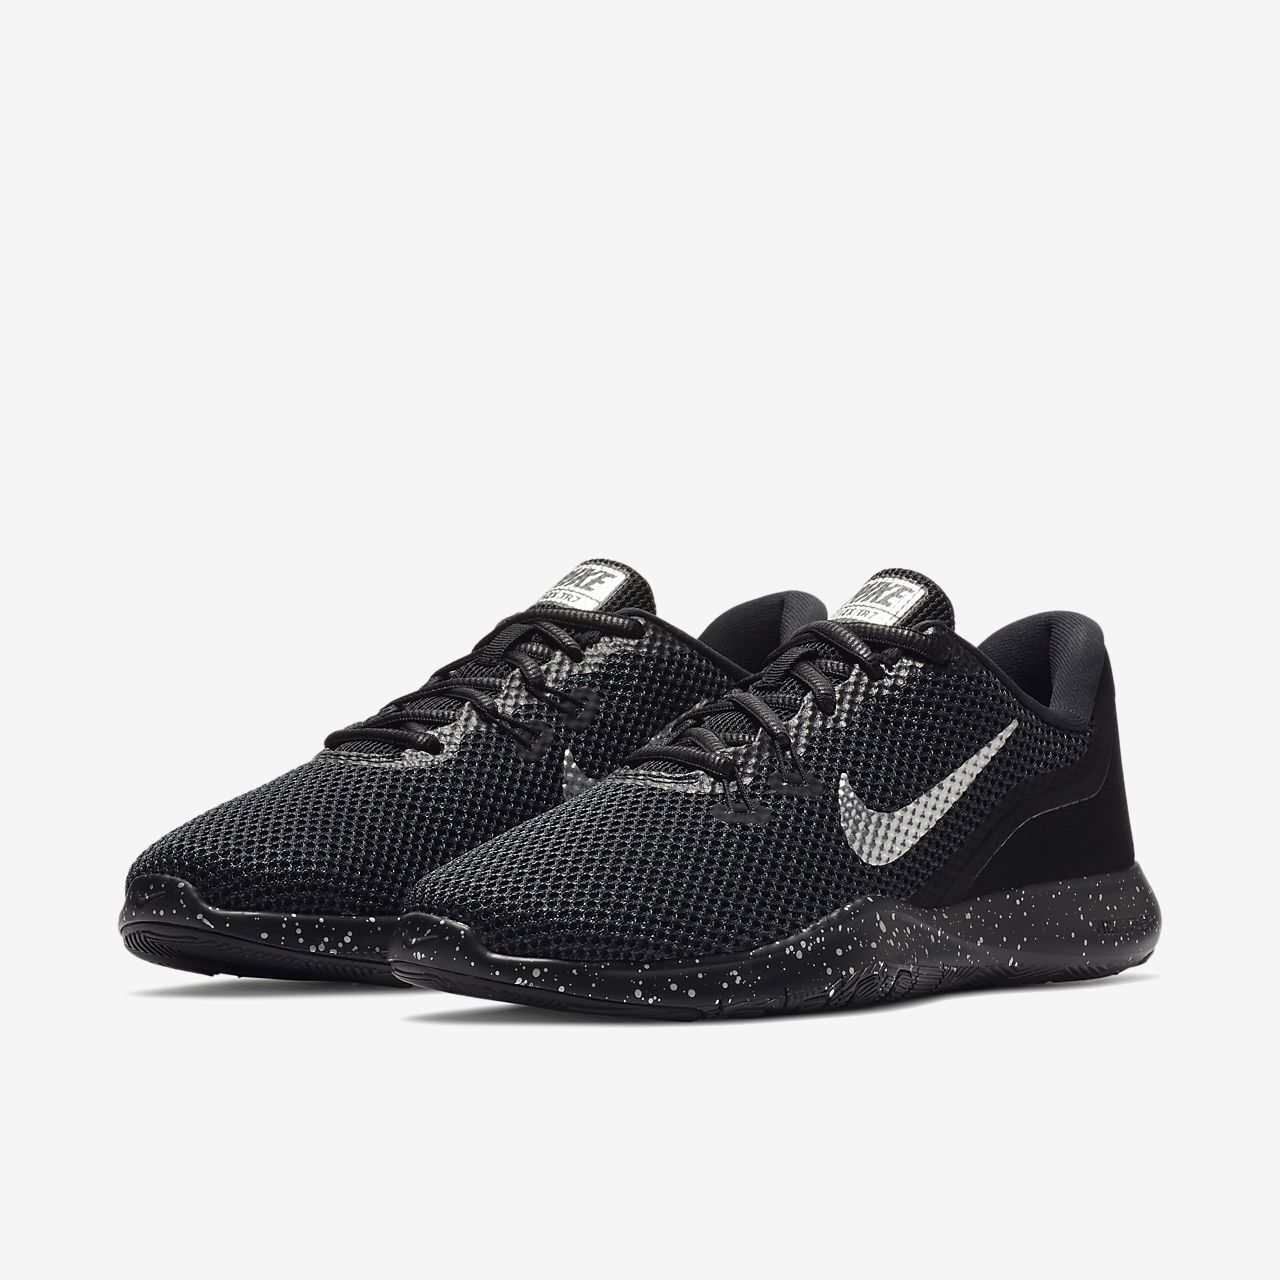 5d88509d9e7 Nike Flex TR 7 Premium Women s Training Shoe. Nike.com AU